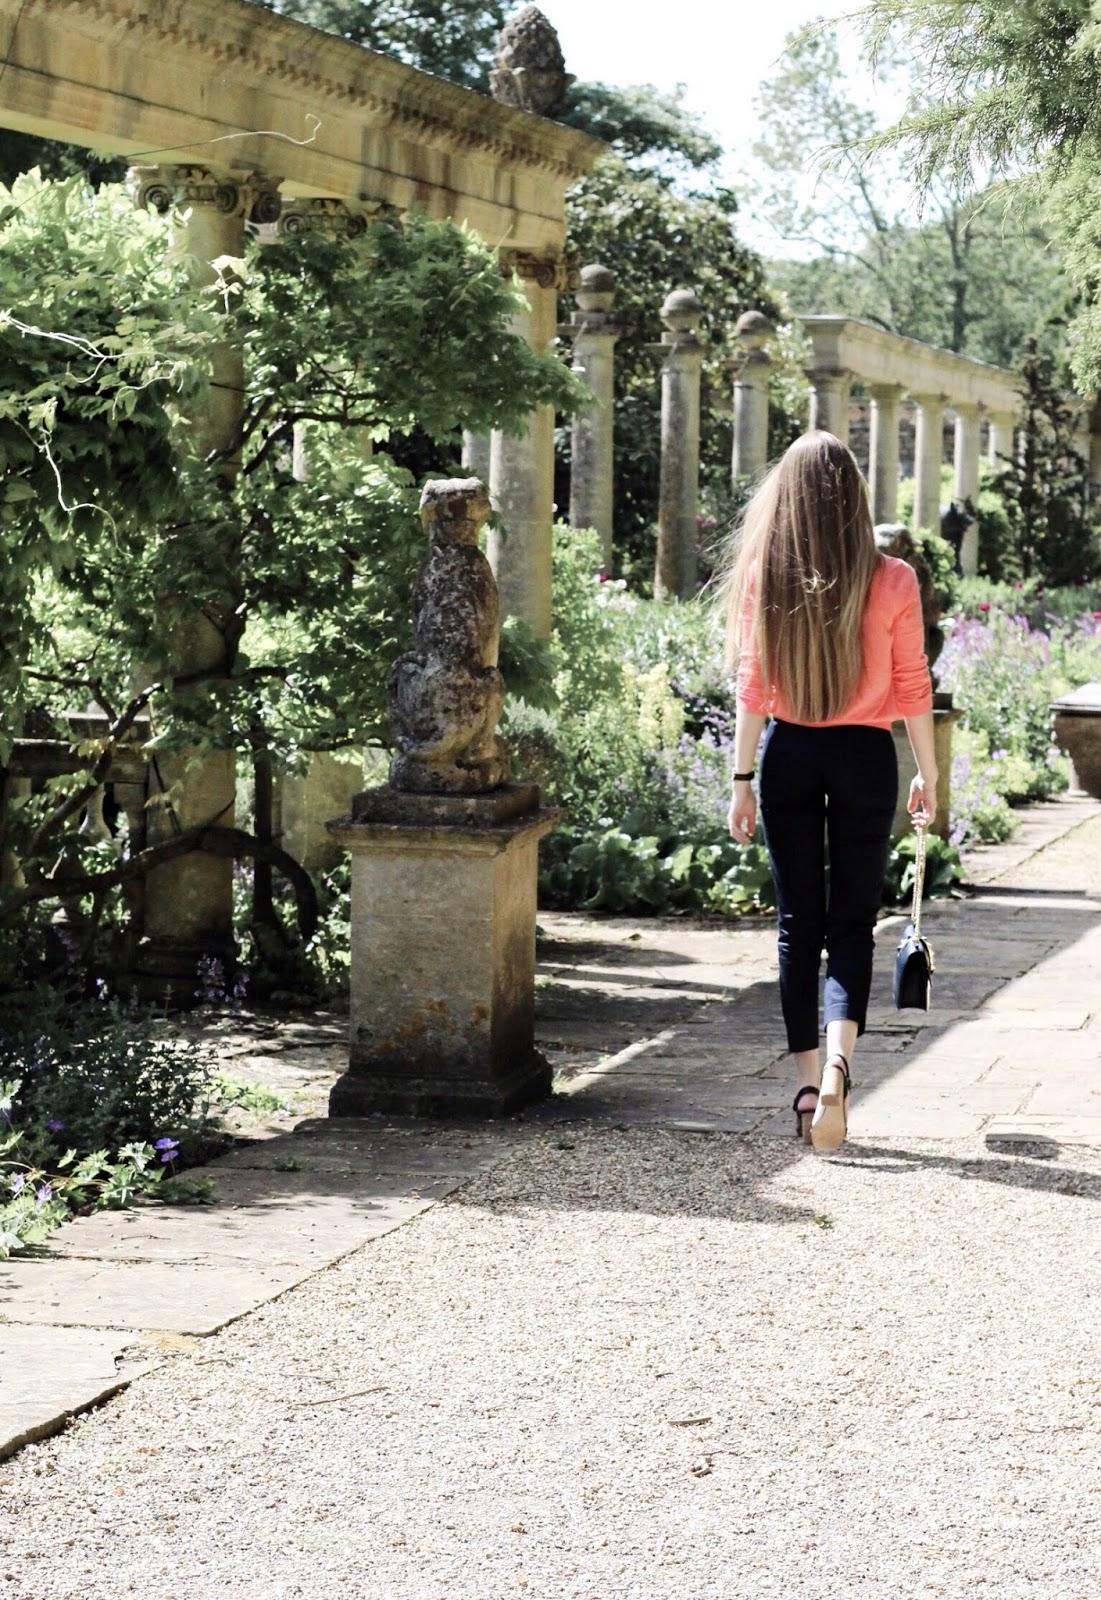 Most beautiful gardens to visit in Bradford-upon-Avon